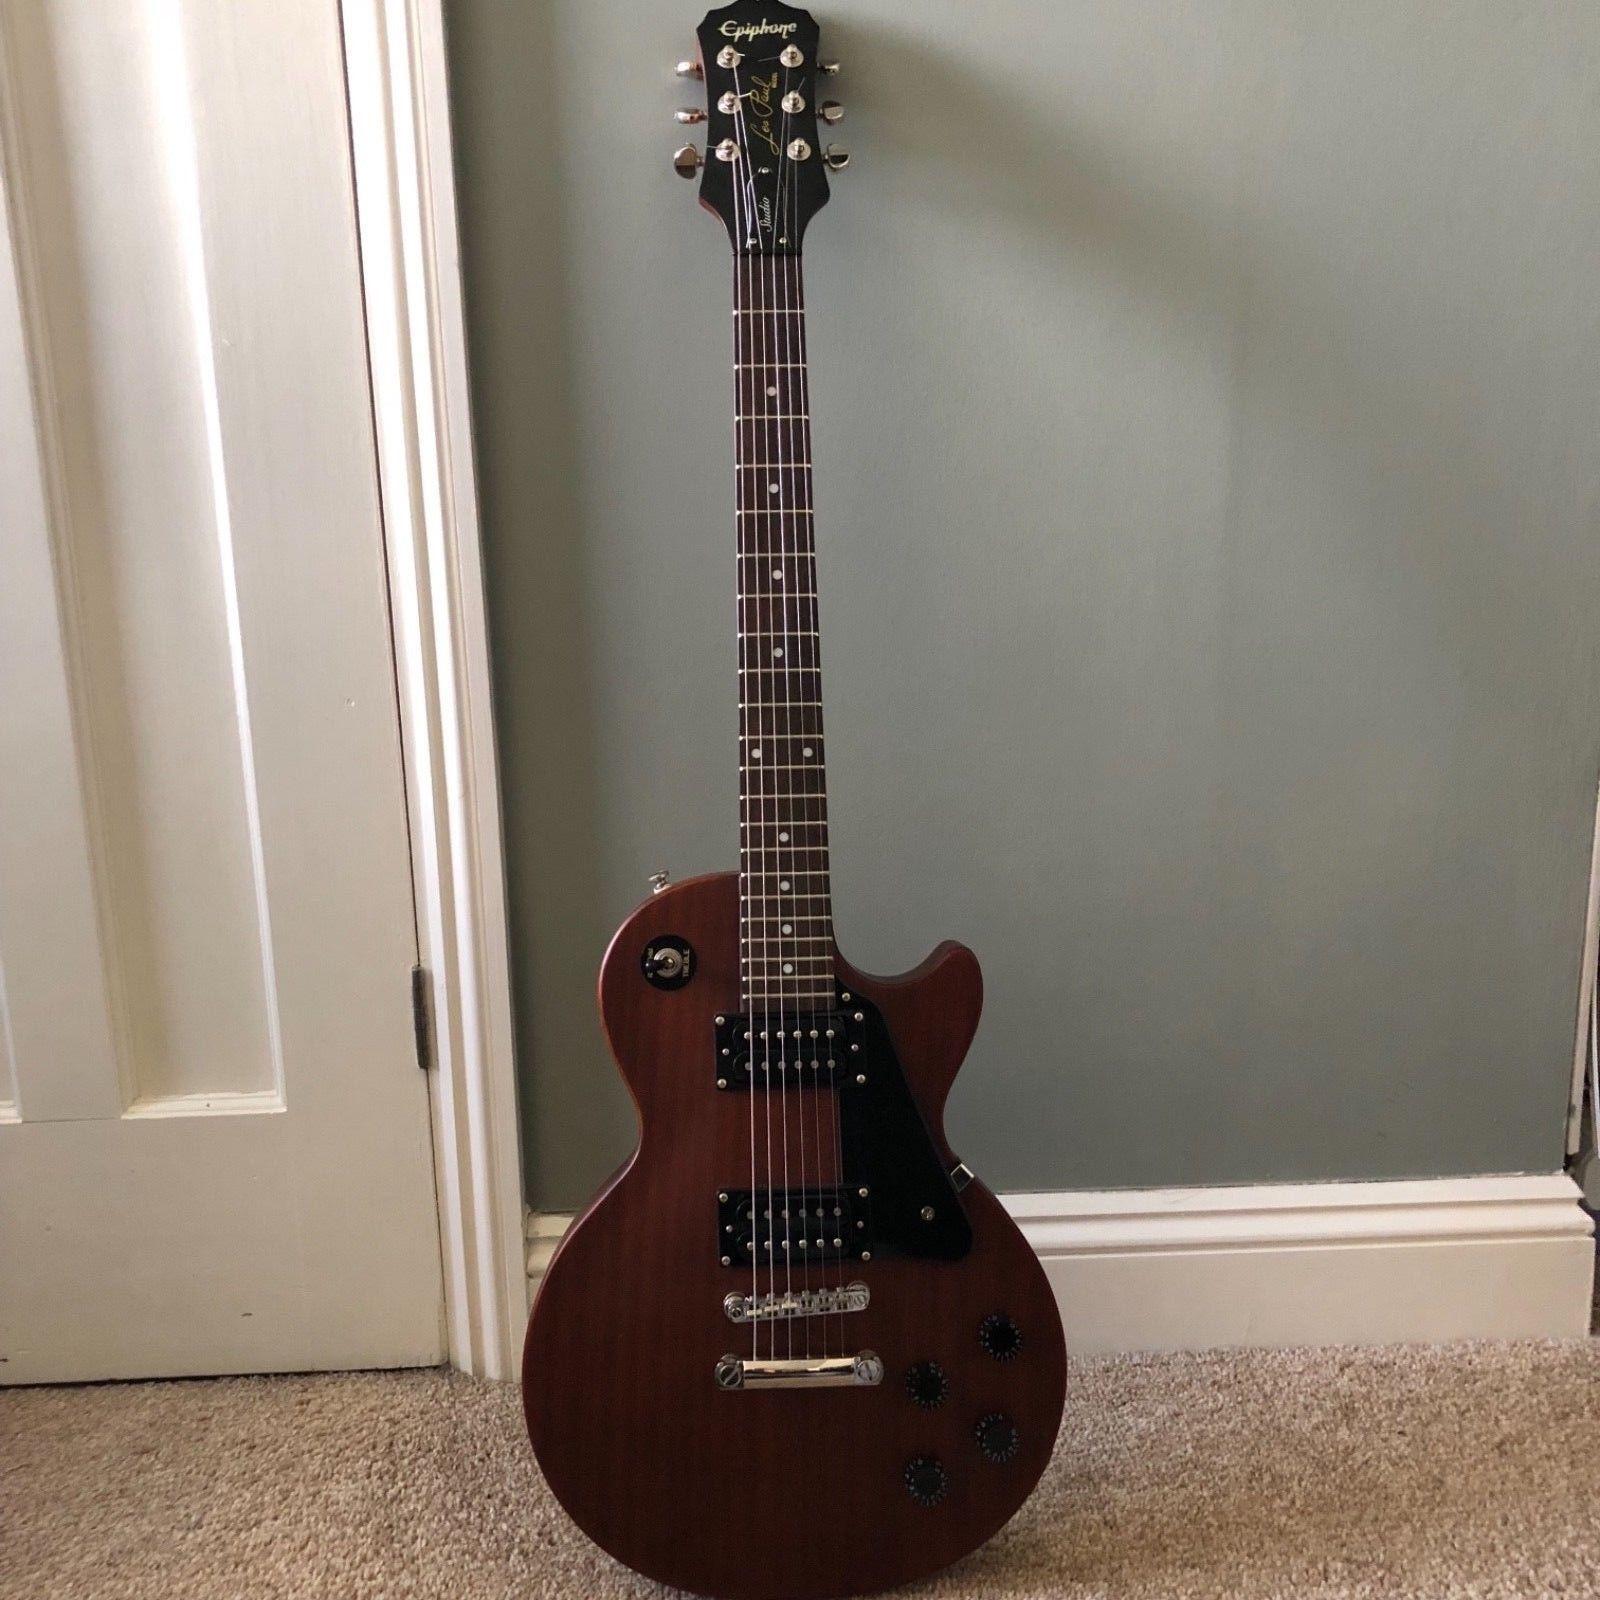 Epiphone Les Paul Studio Electric Guitar In Worn Cherry Satin Gibson Sgj Wiring Diagram Finish